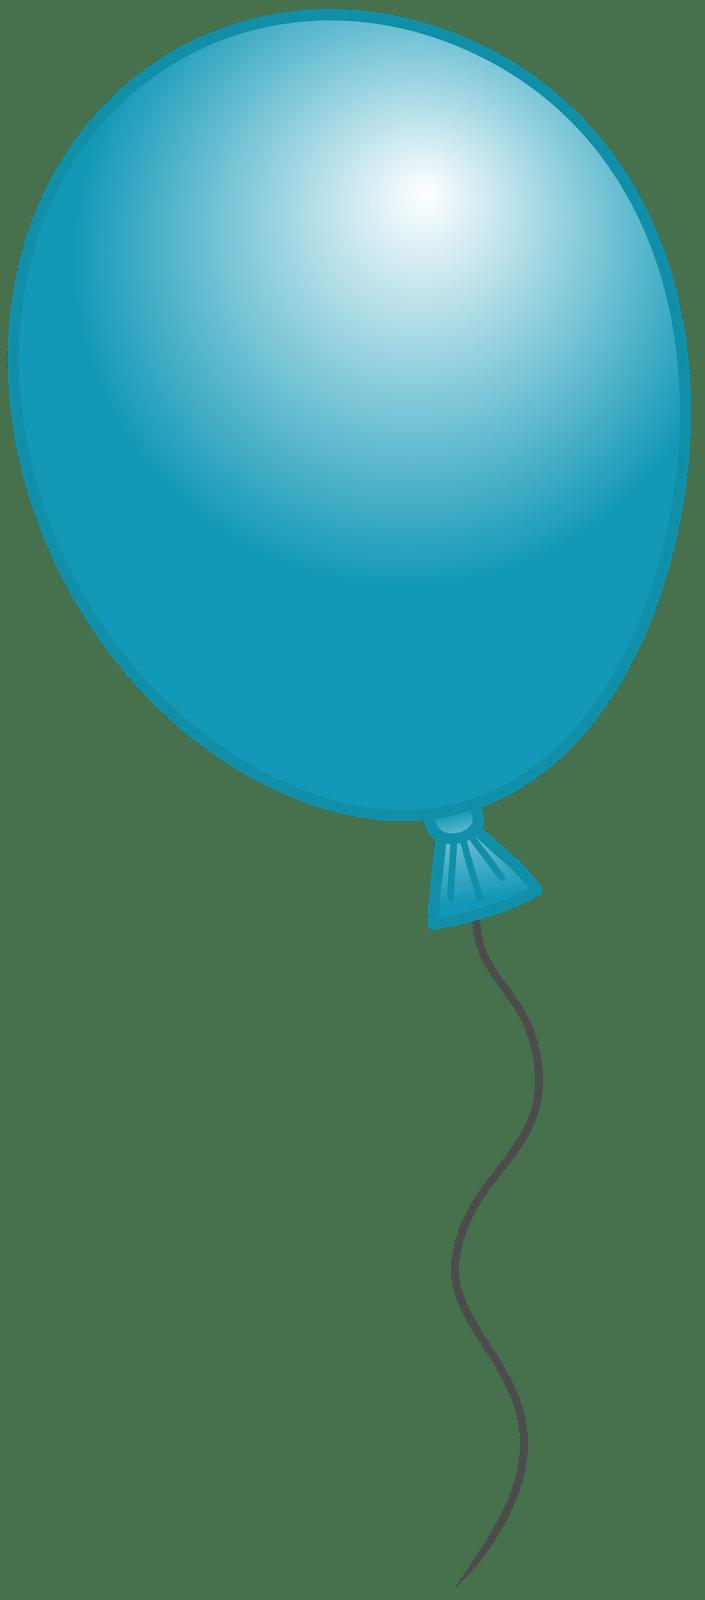 medium resolution of red balloon clip art clipart image 4 5